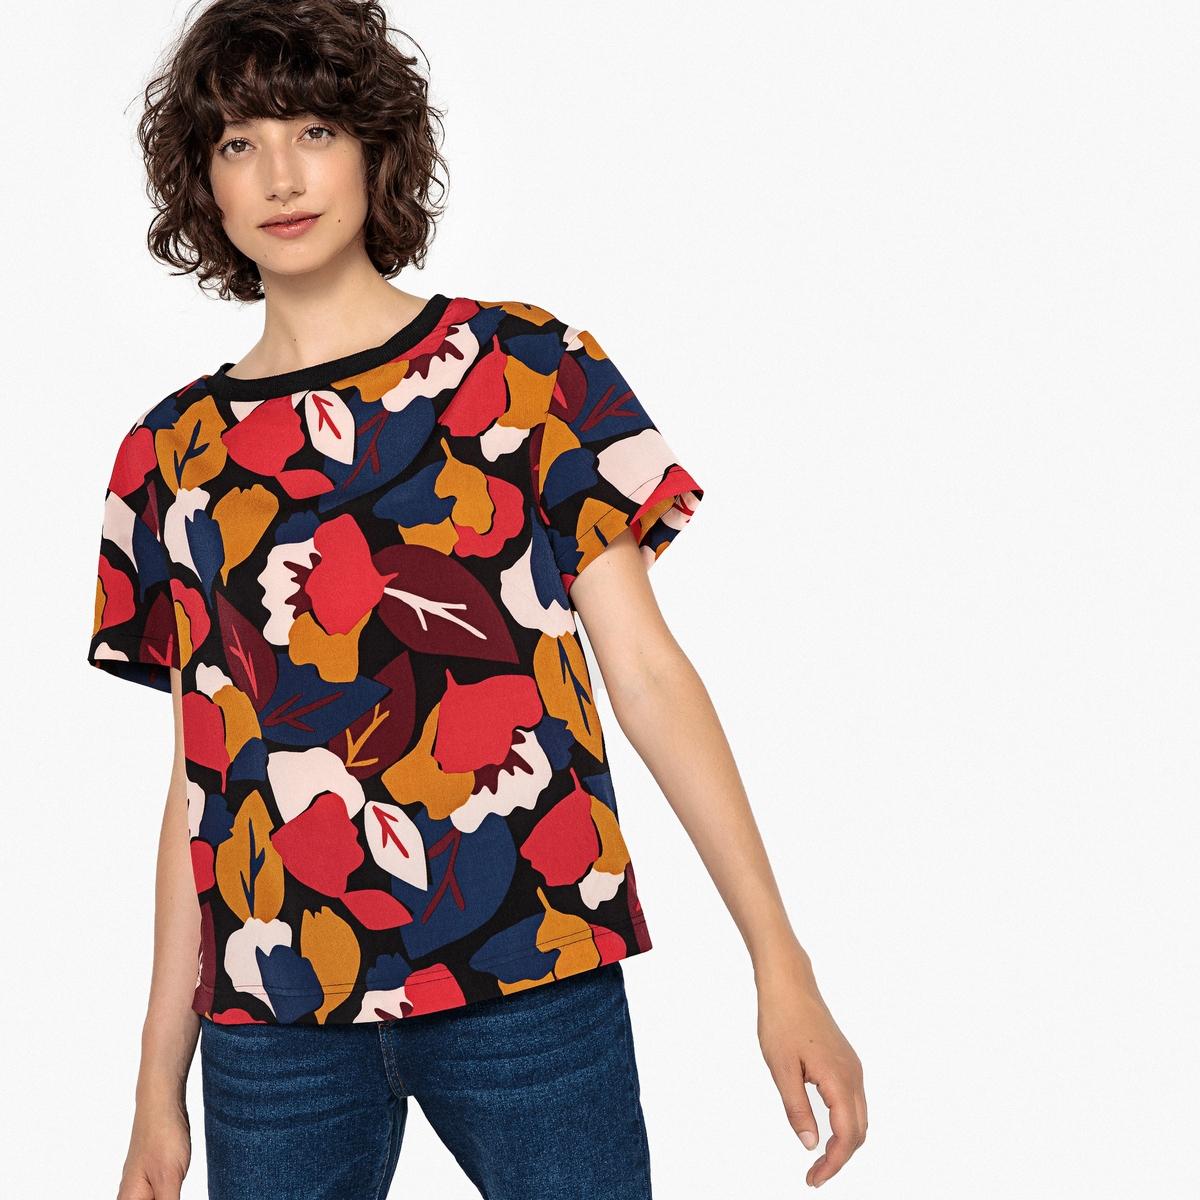 Blusa estampada con cuello redondo y manga corta